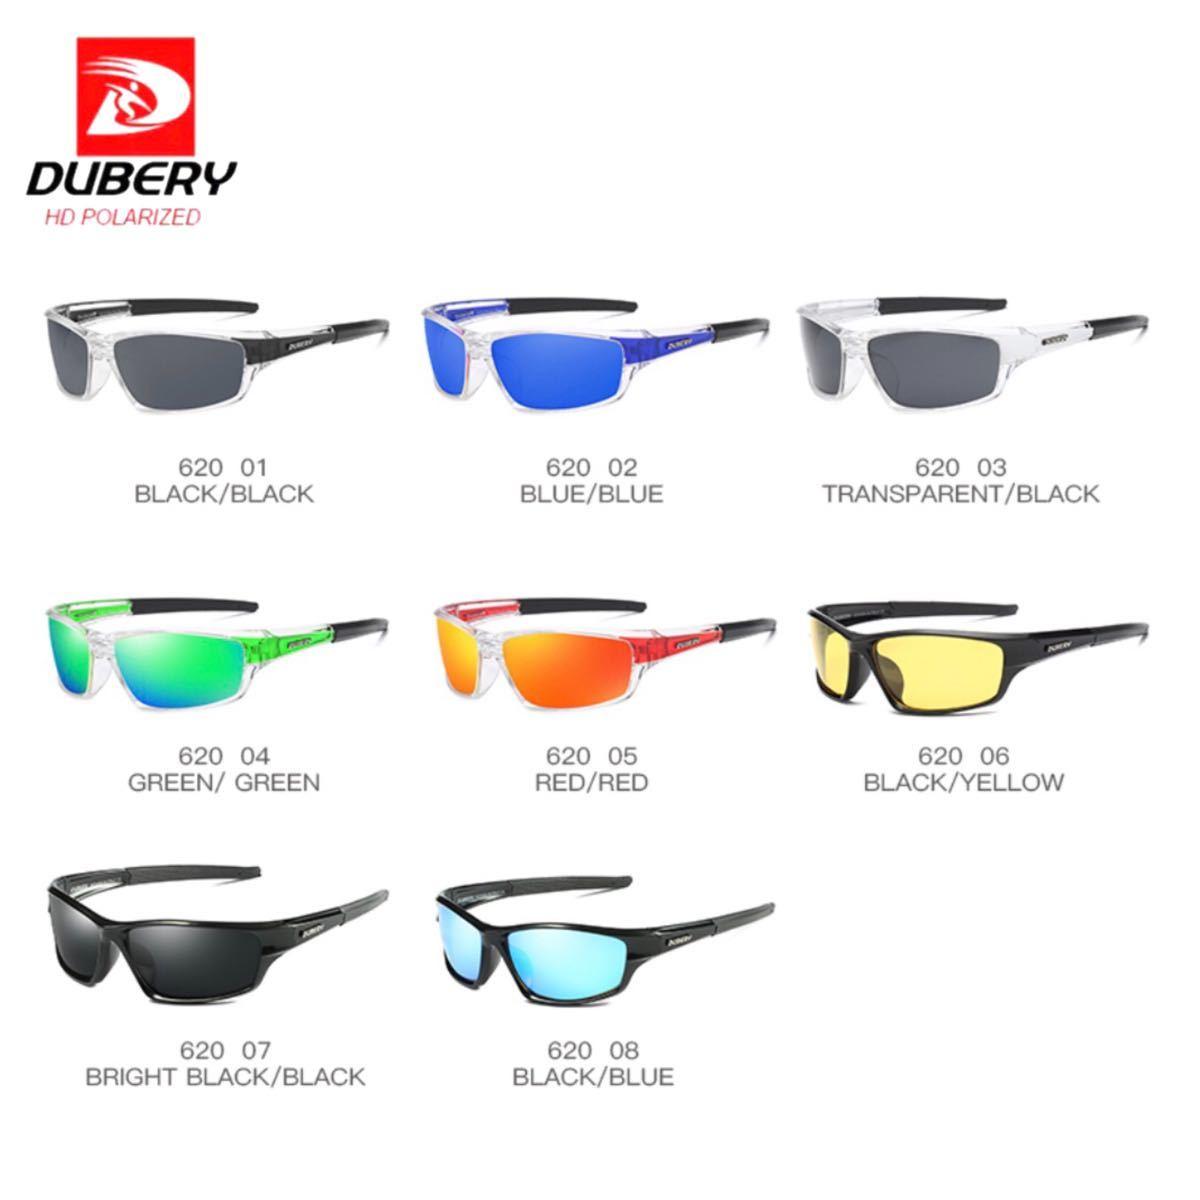 DUBERY サングラス 偏光グラス UV400 軽量 車  釣り アウトドア 偏光サングラス スポーツサングラス